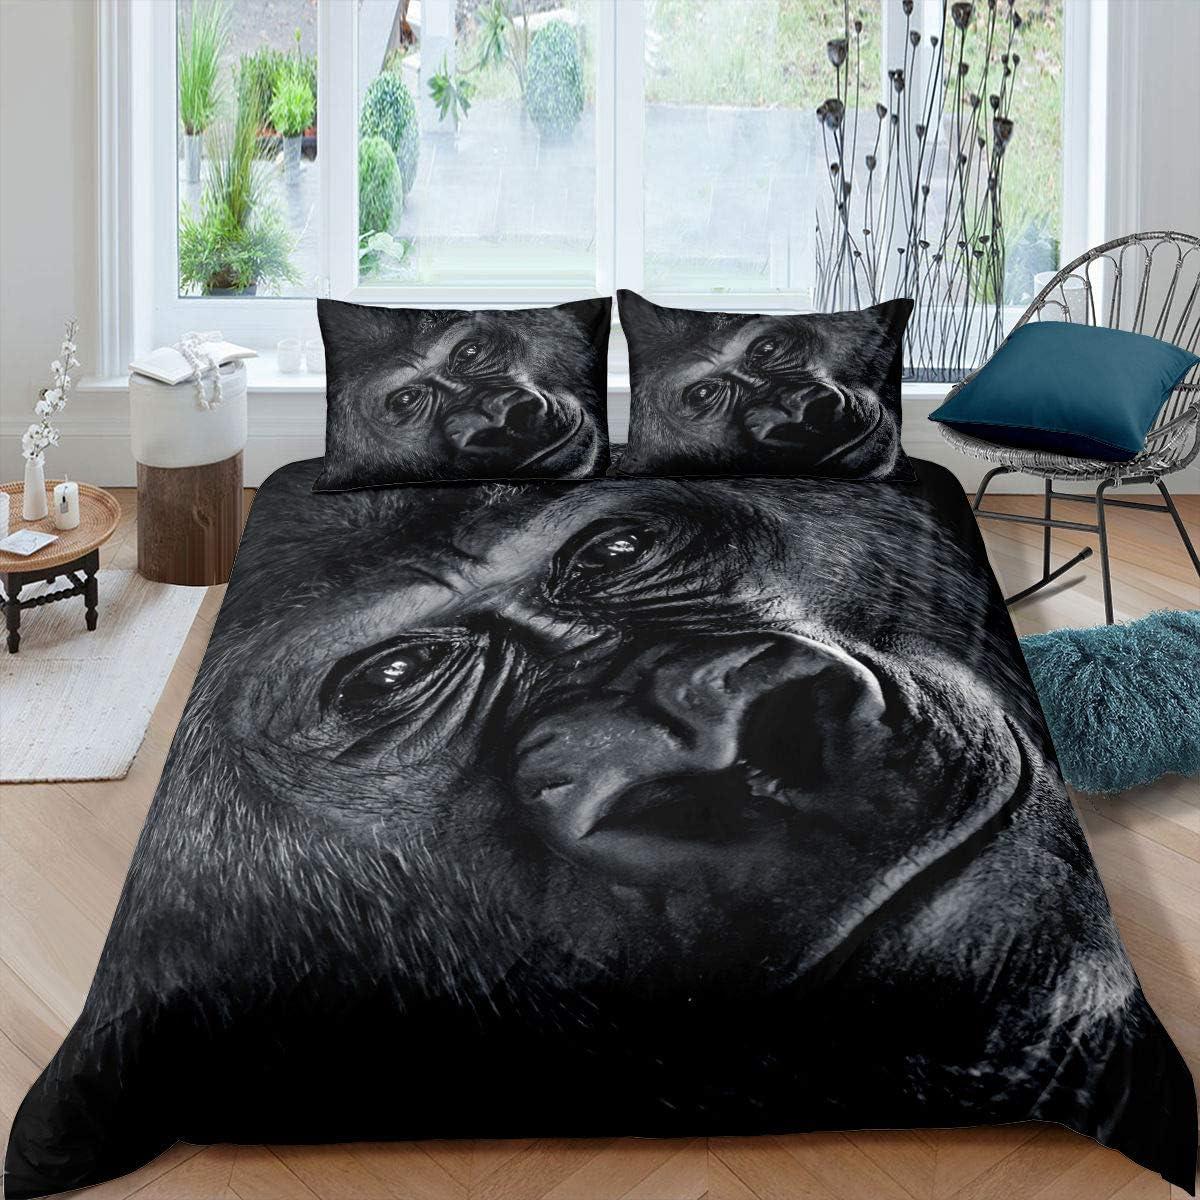 Orangutan Max 45% OFF Duvet Cover Outlet SALE Bohemian Monkey Set For Ki Printed Bedding